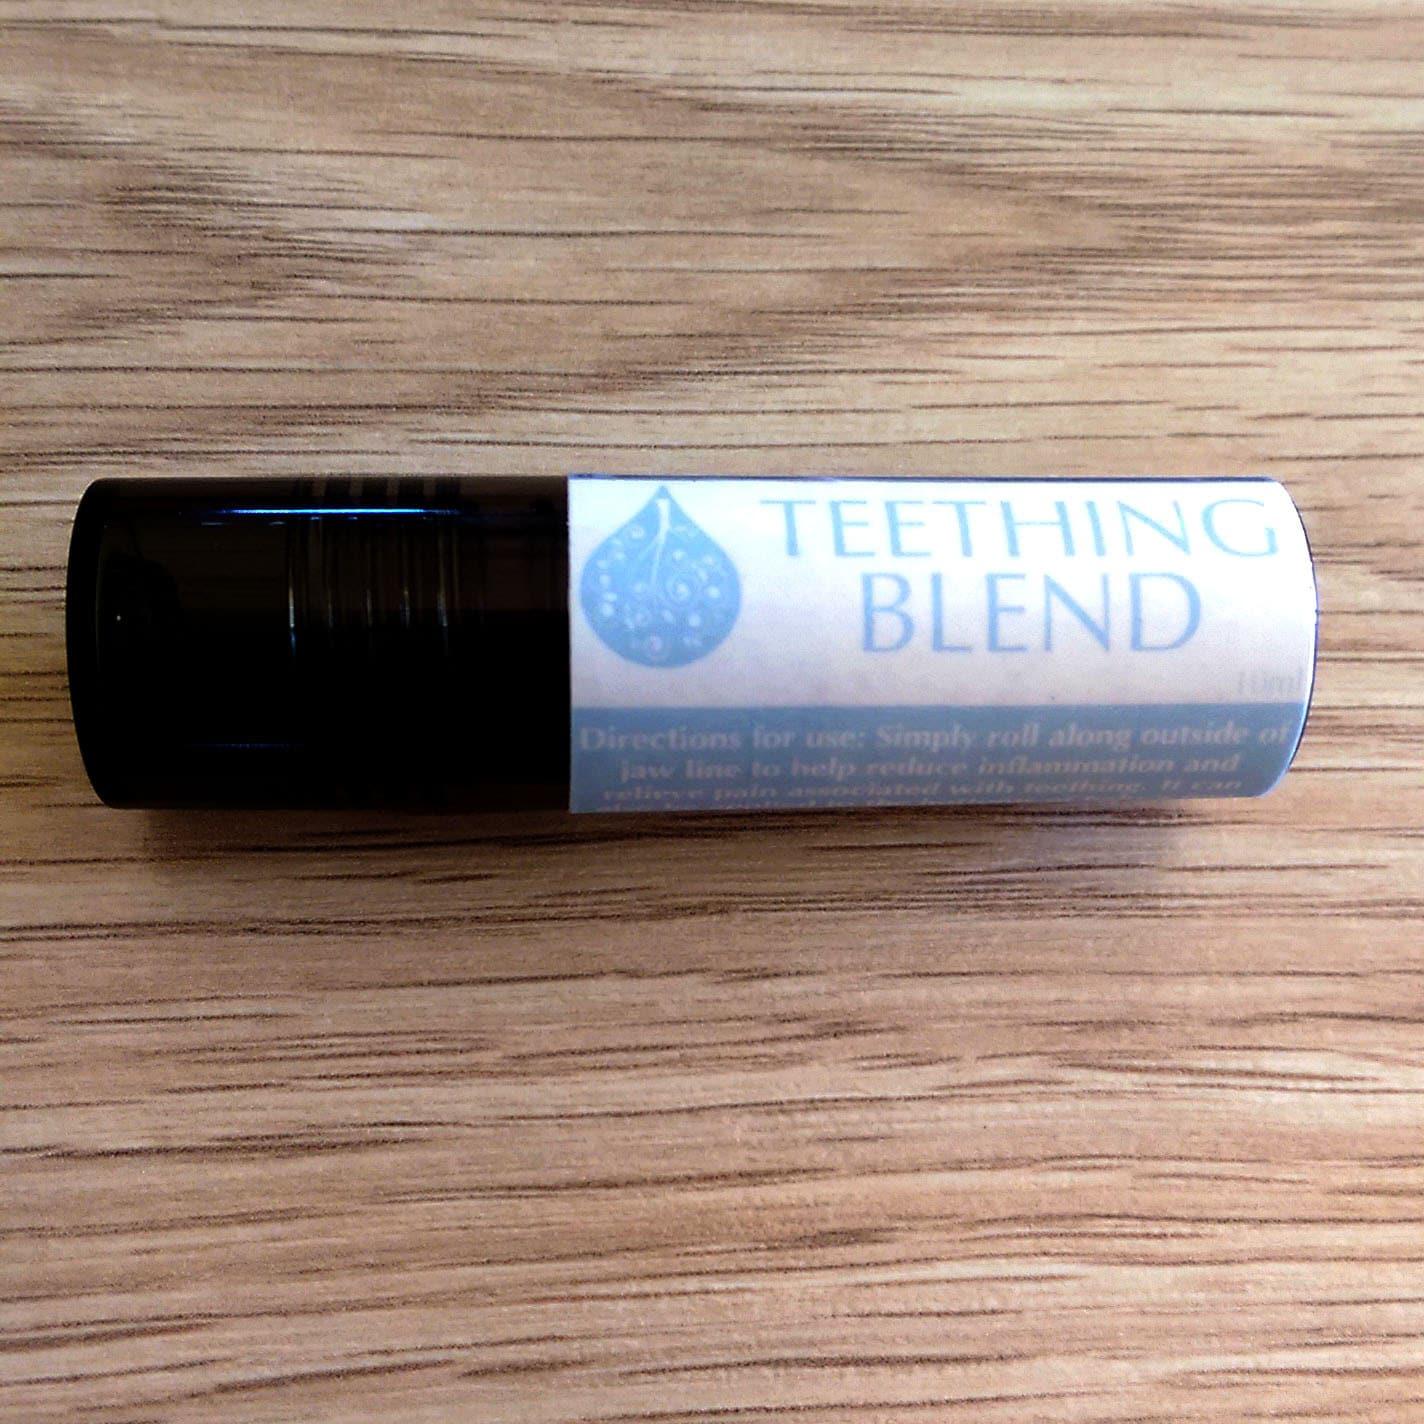 Teething Blend Roller 10ml Bottle Baby Safe Aromatherapy